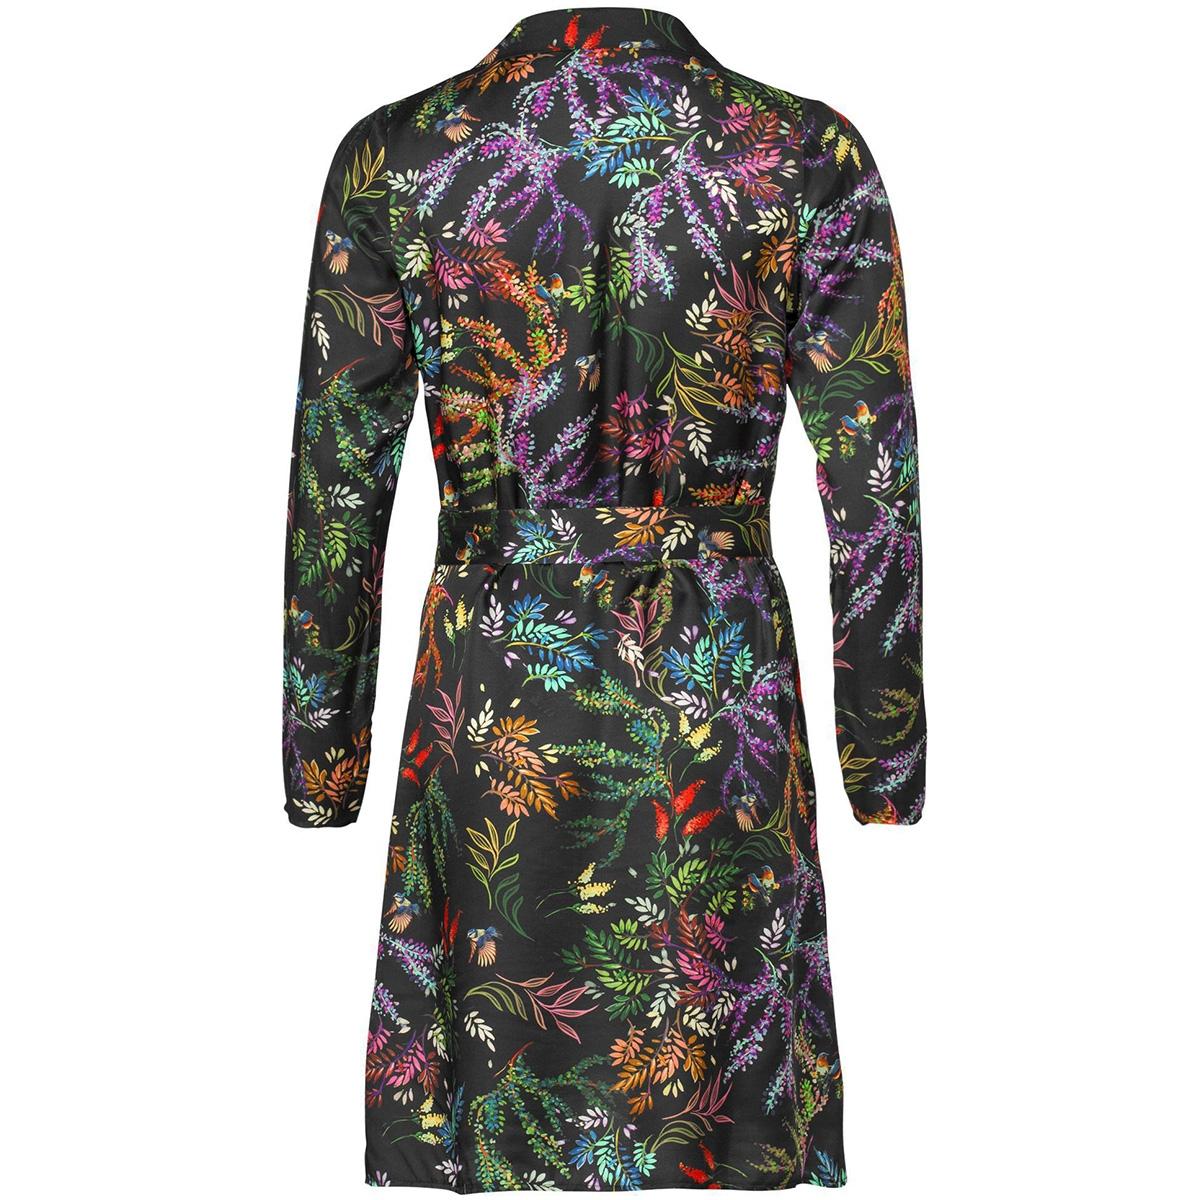 dress aop flower with strap 97827 geisha jurk black/multi color